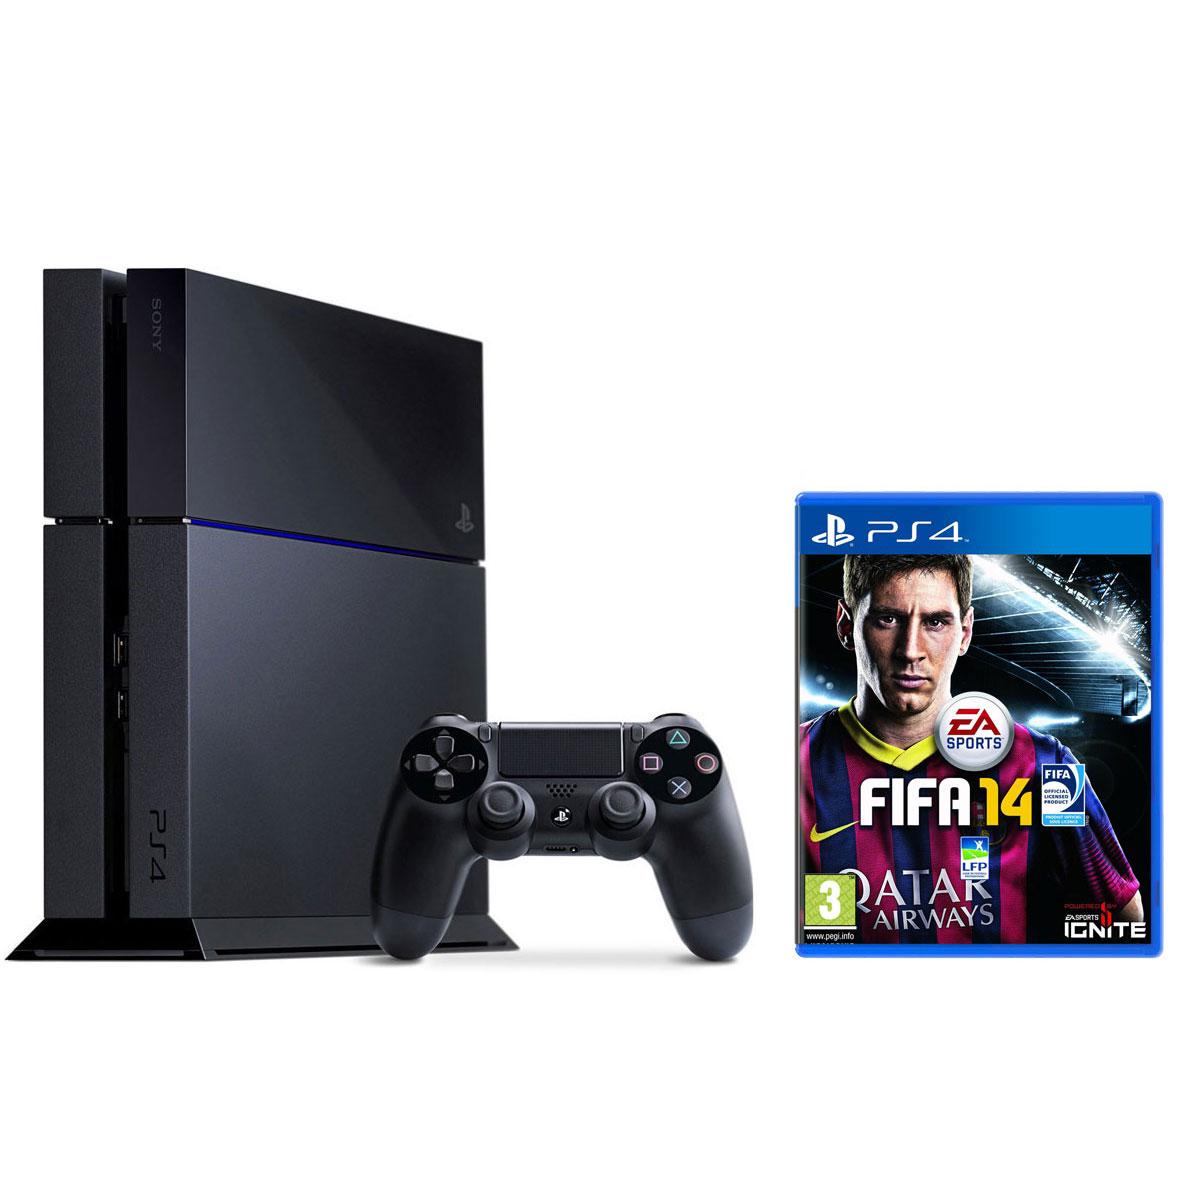 Console de jeux Sony PlayStation 4 + FIFA 14 Console PlayStation 4 500 Go + Une Manette Dual Shock 4 + FIFA 14